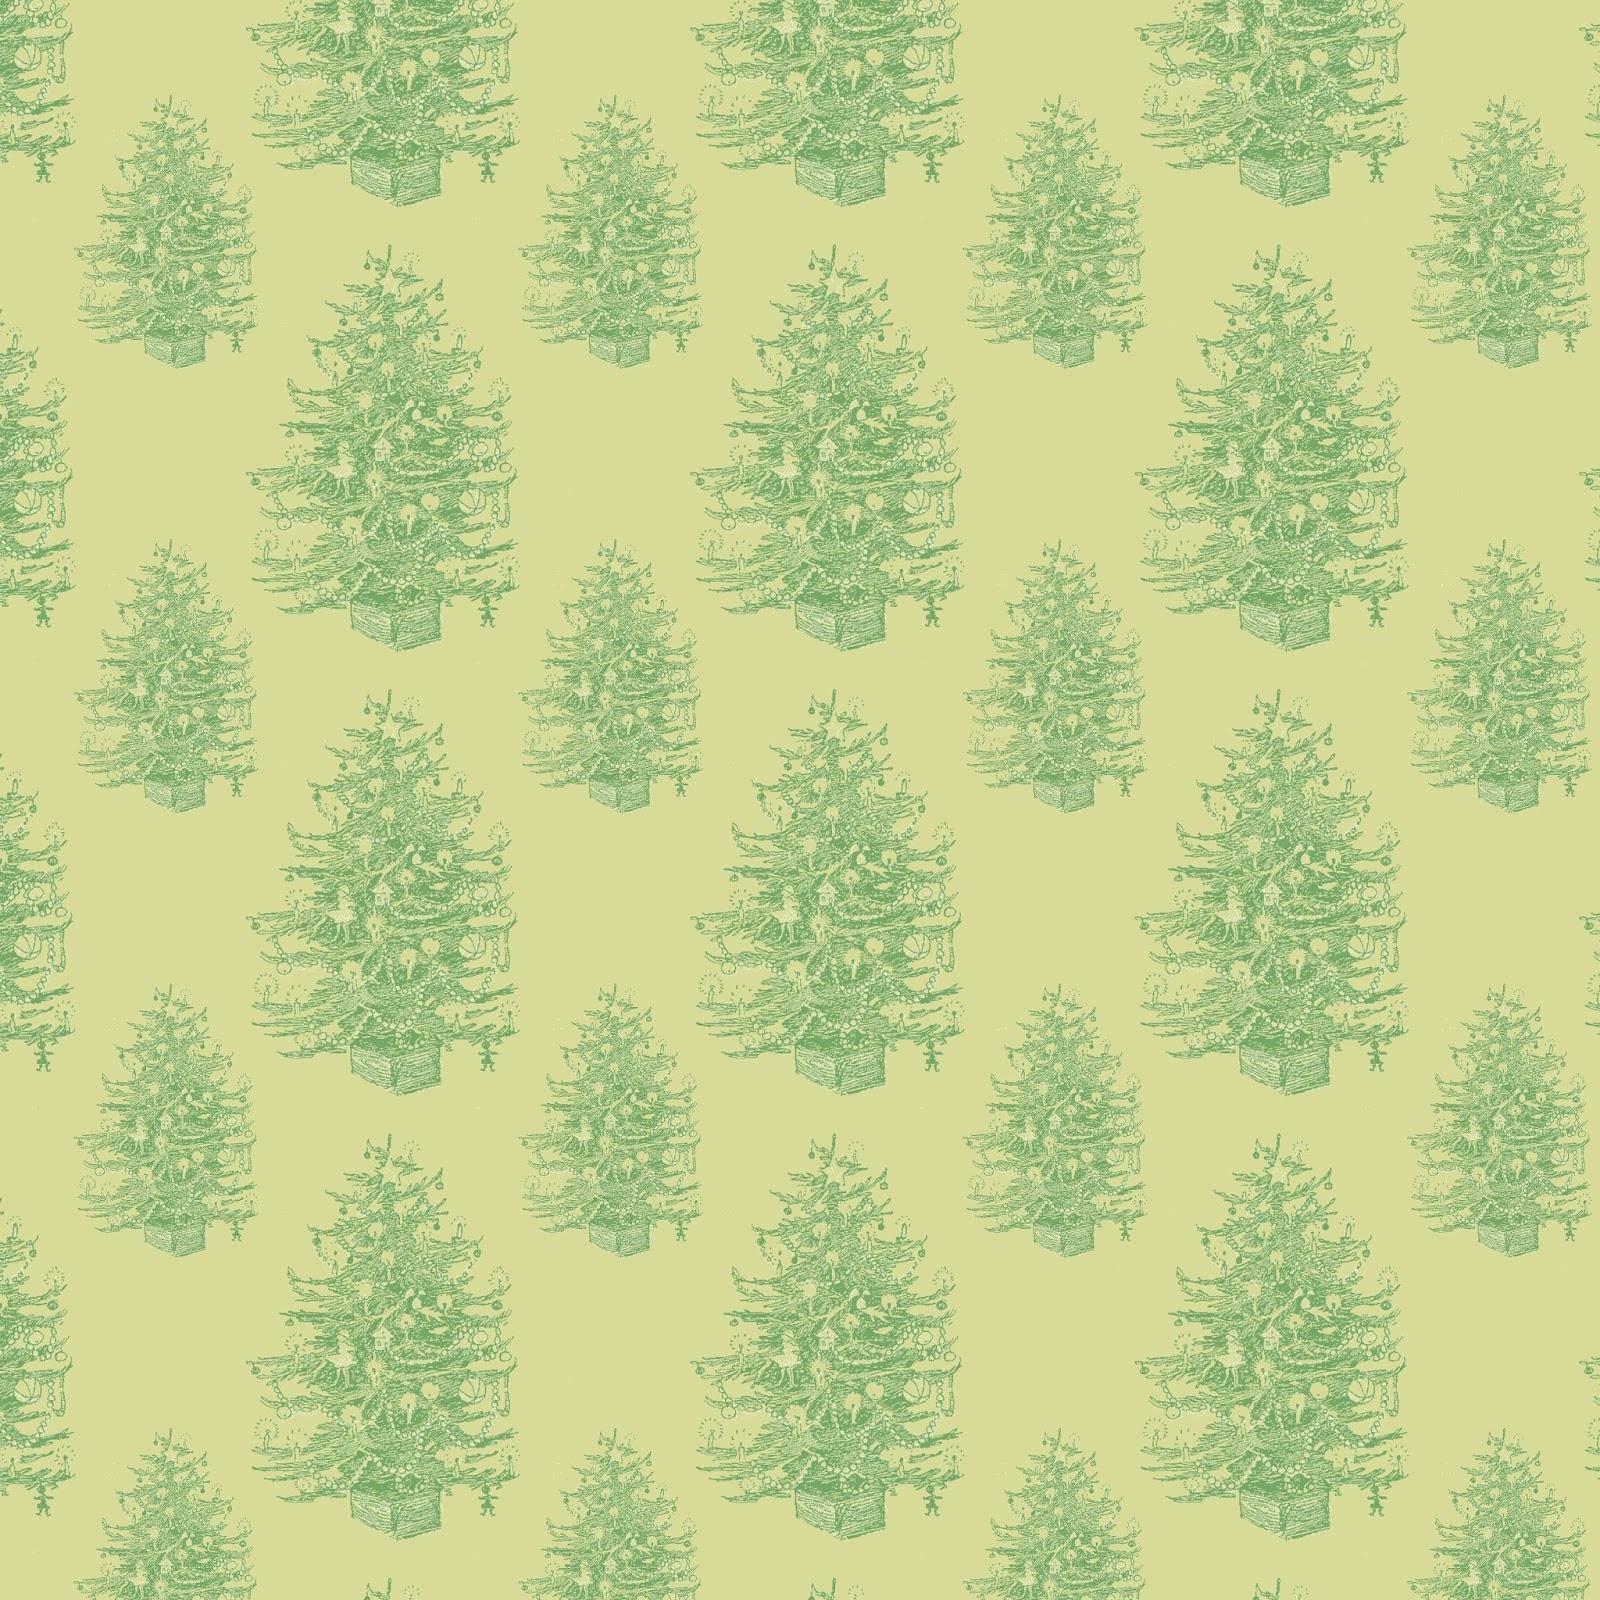 graphic regarding Christmas Printable Paper known as The Graphics Monarch: Printable Xmas Tree Electronic